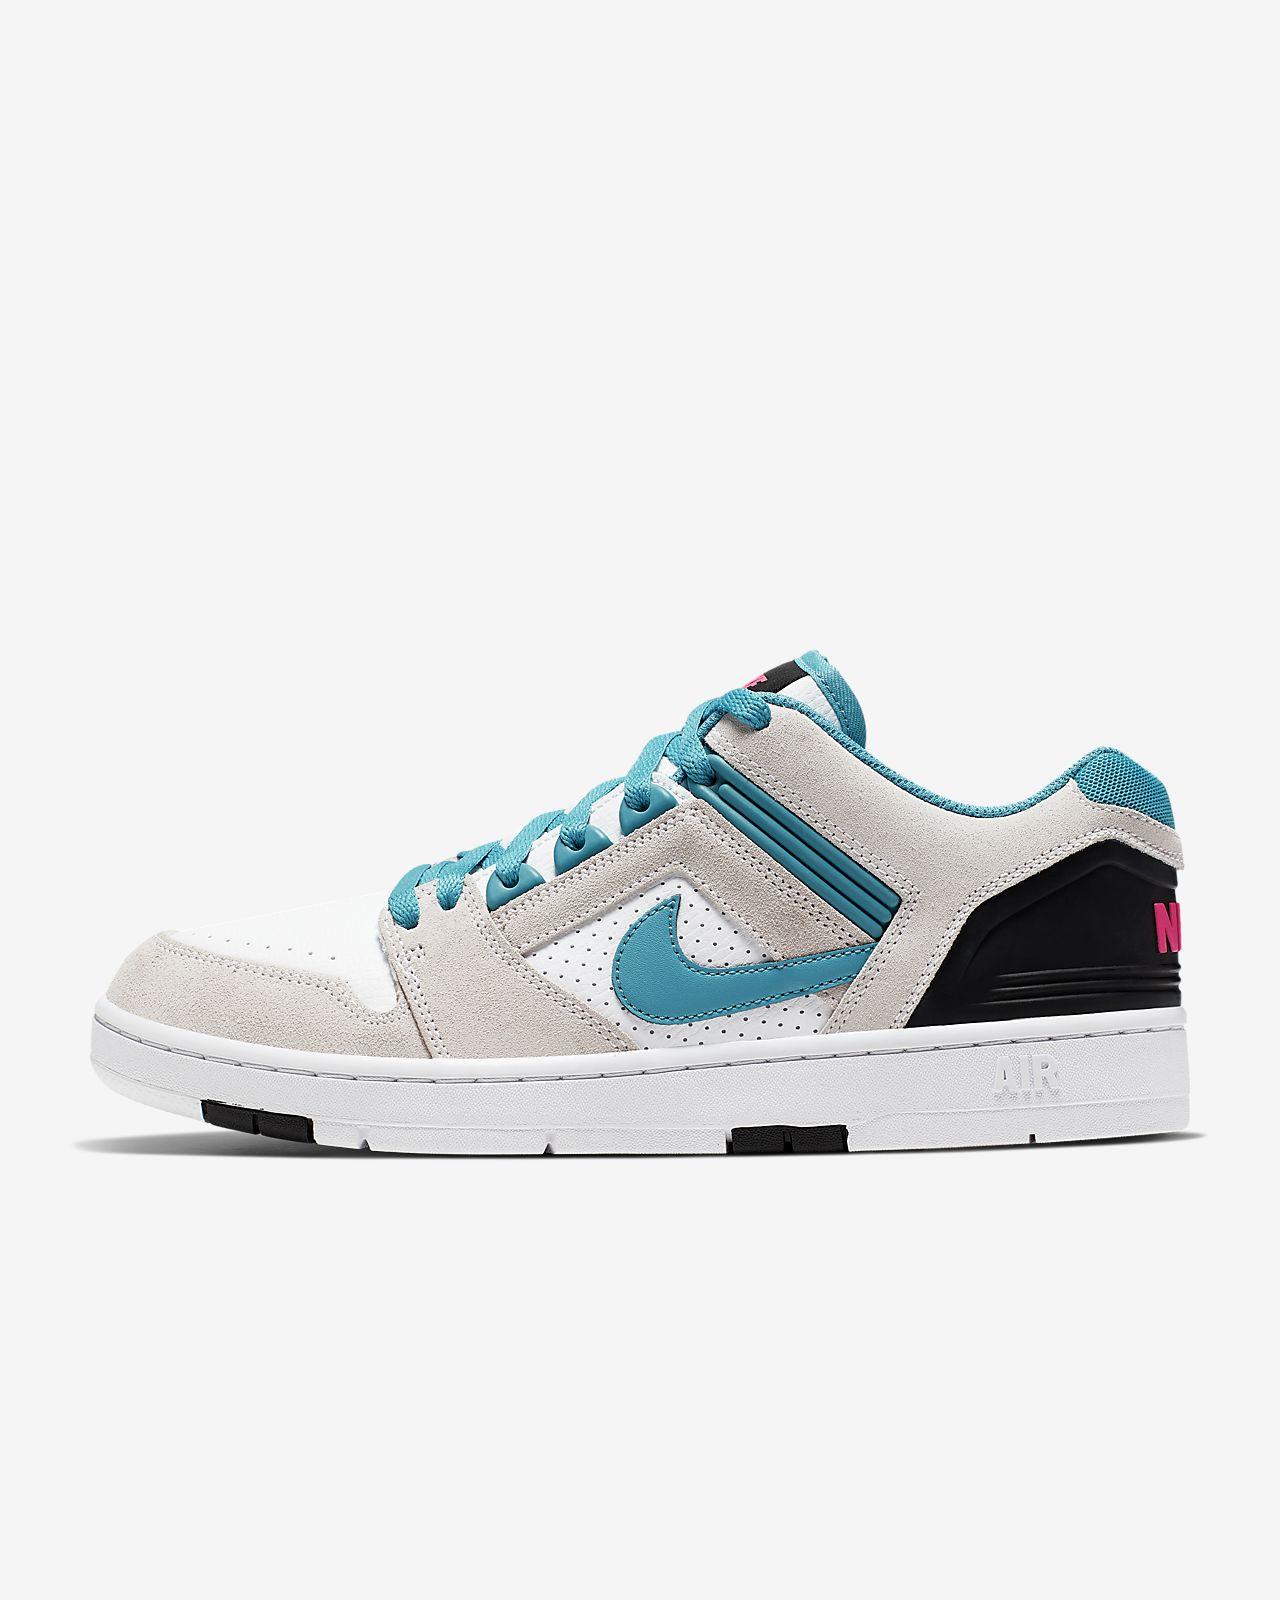 Nike SB Air Force II Low Men's Skateboarding Shoe